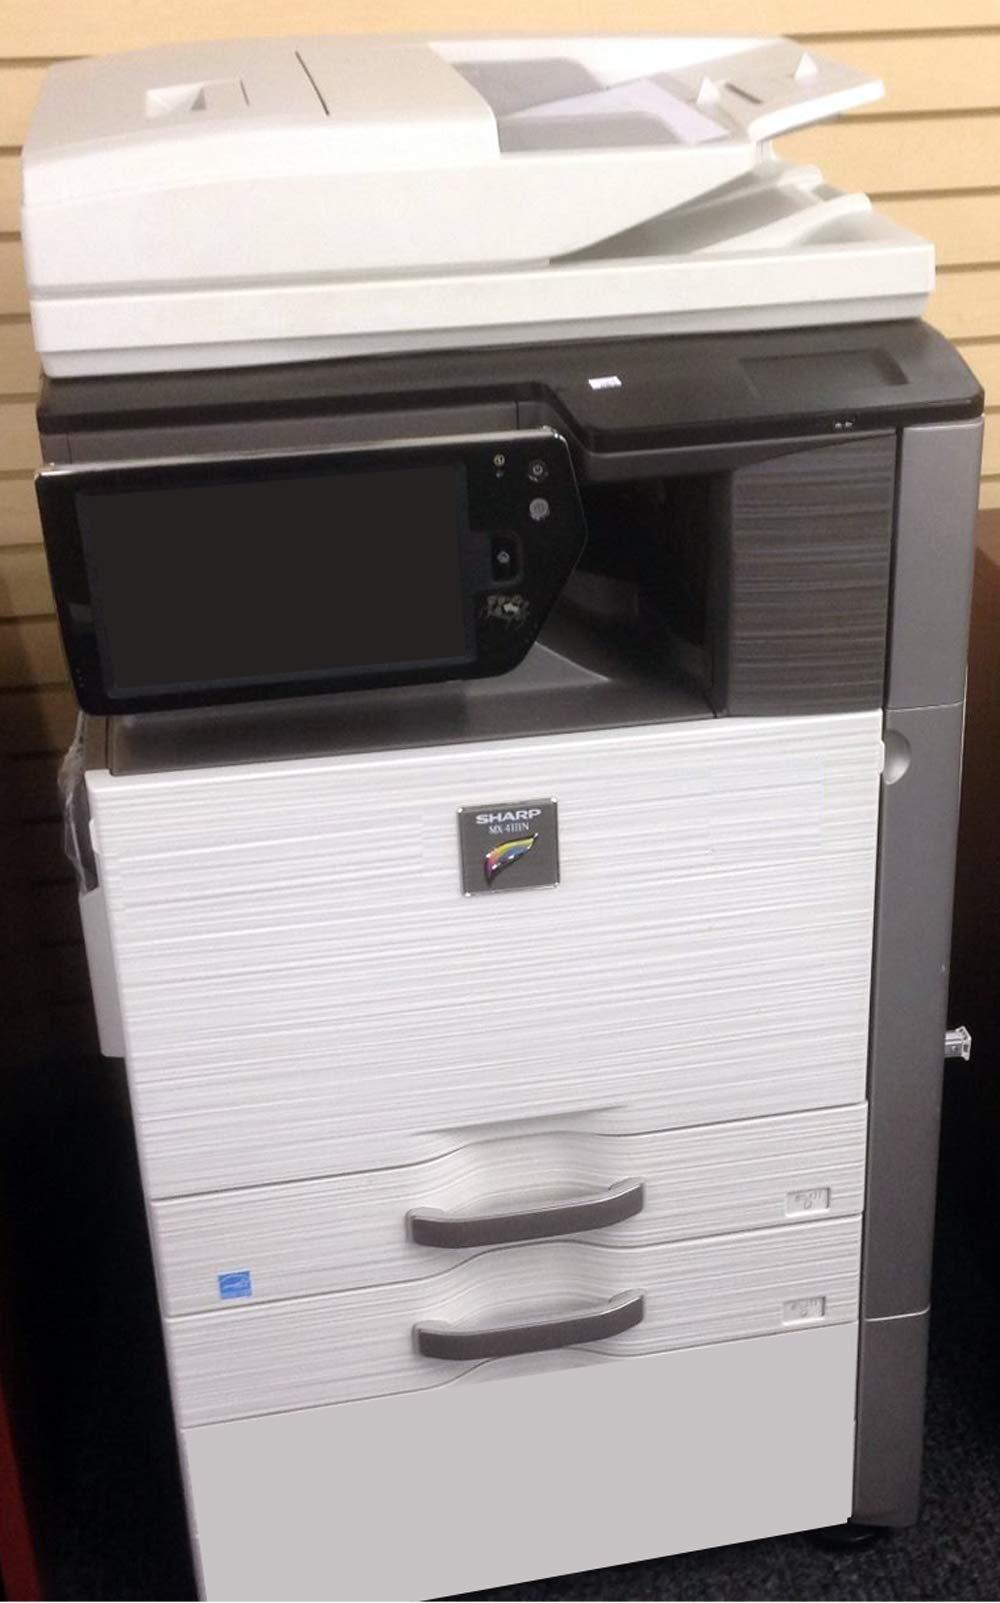 Amazon.com: Sharp MX-42N Color Laser Printer Copier Scanner